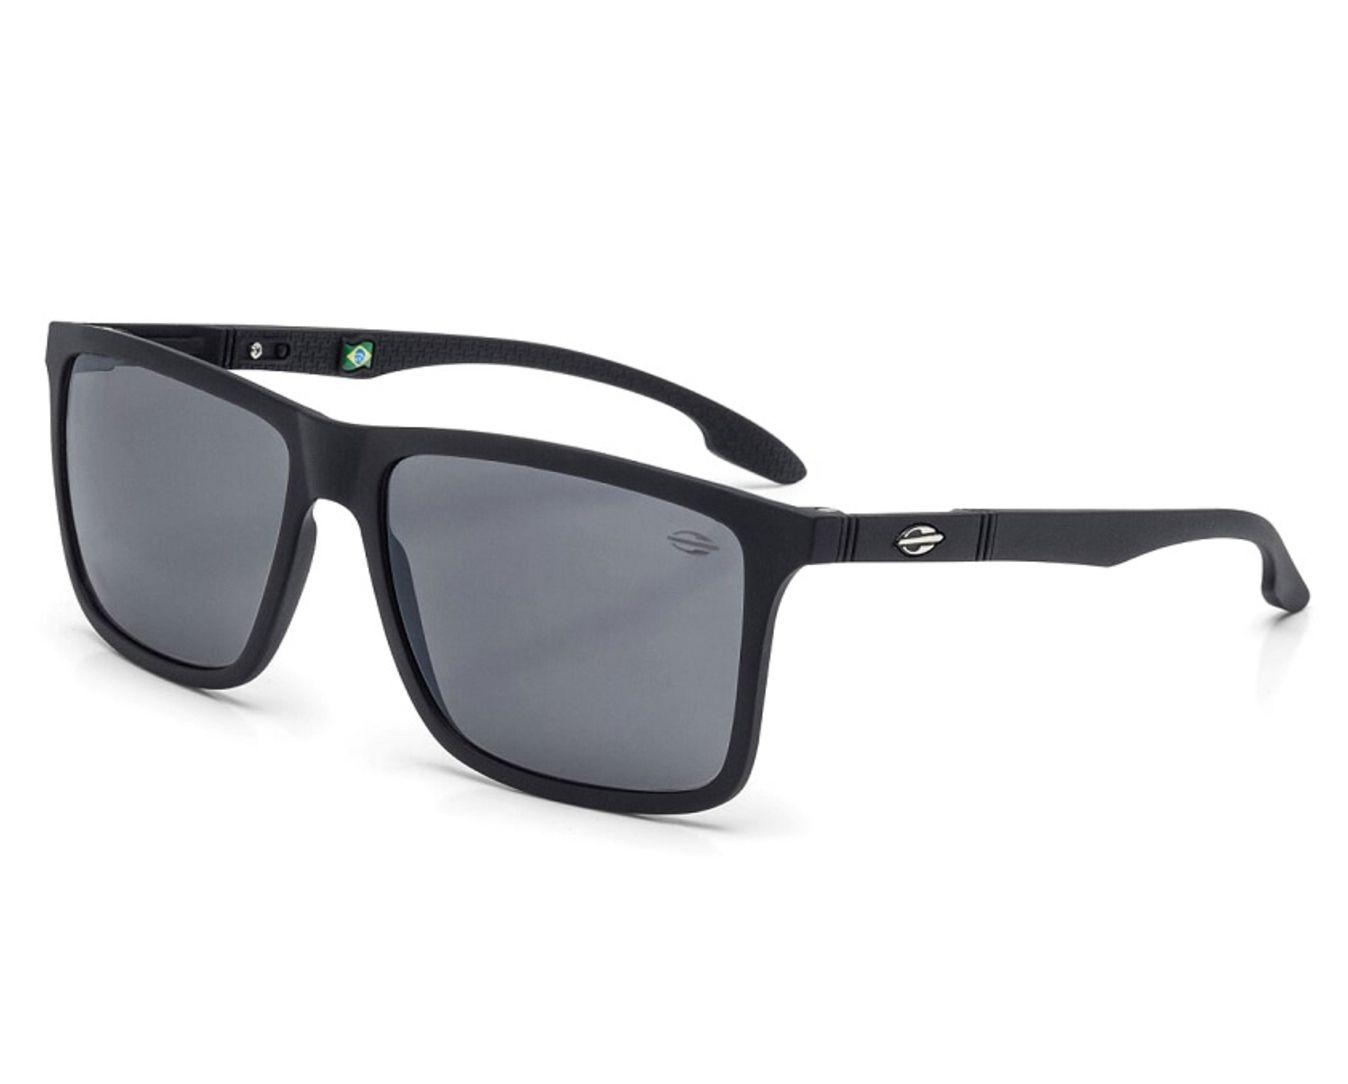 Óculos de Sol Mormaii Kona Masculino M0036A1409MormaiiÓculos de ... 127e4b3b23